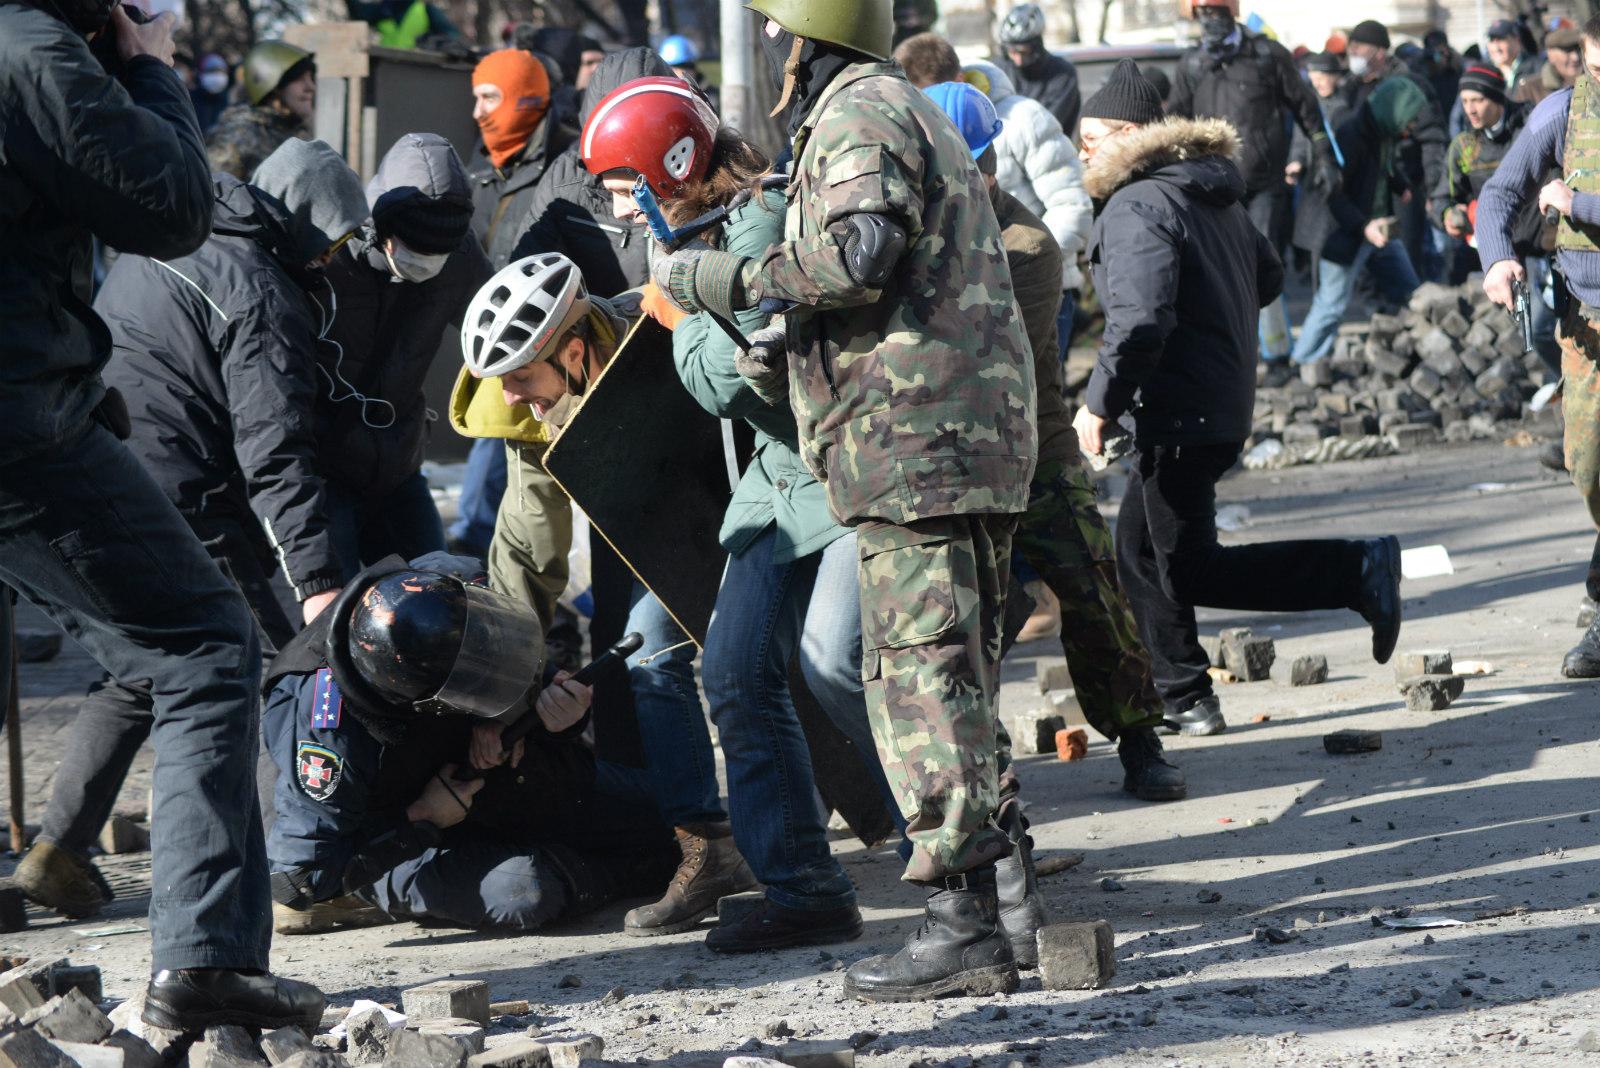 Invisible borders during the 2014 Ukrainian revolution (Mstyslav Chernov/Unframe - Wikimedia Commons)